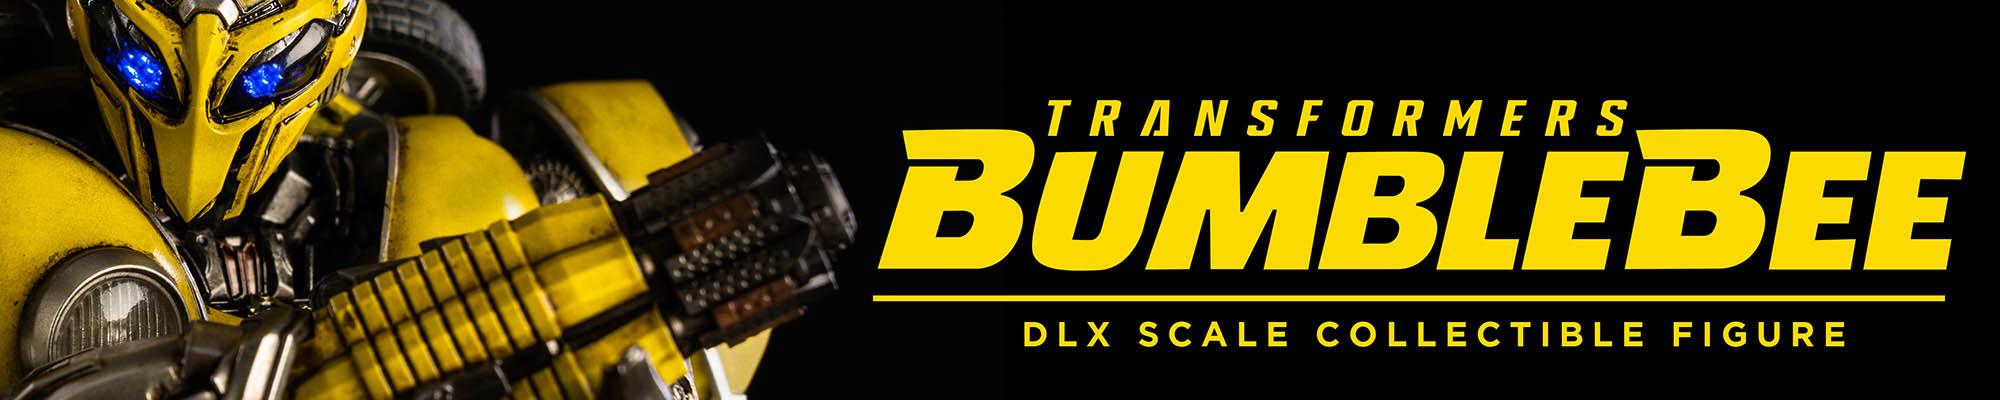 3A 公布 DLX 比例收藏系列大黄蜂模型,现已开启预订